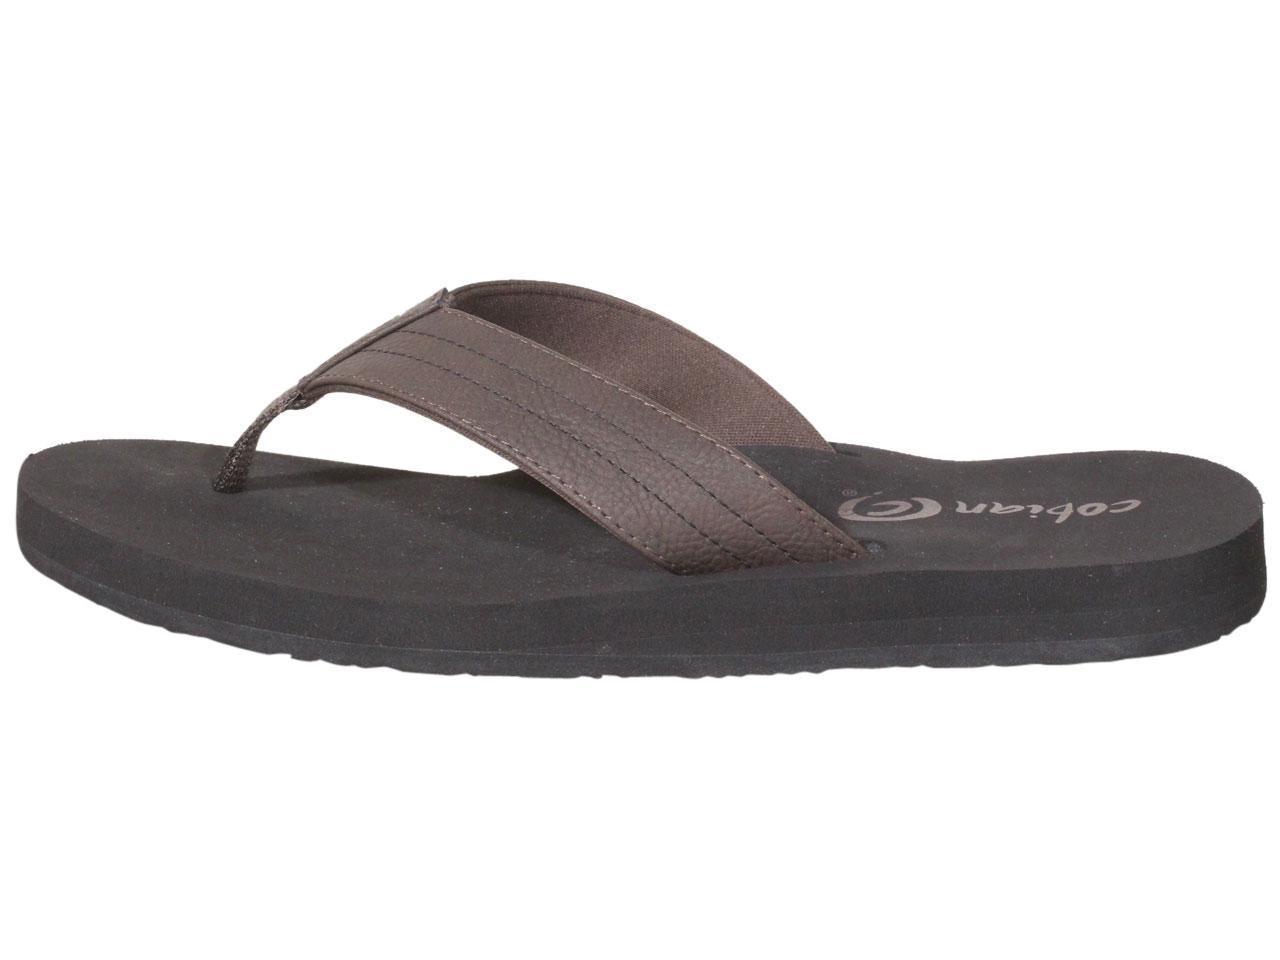 Cobian The Costa Flip Flops Men/'s Thongs Sandals Shoes